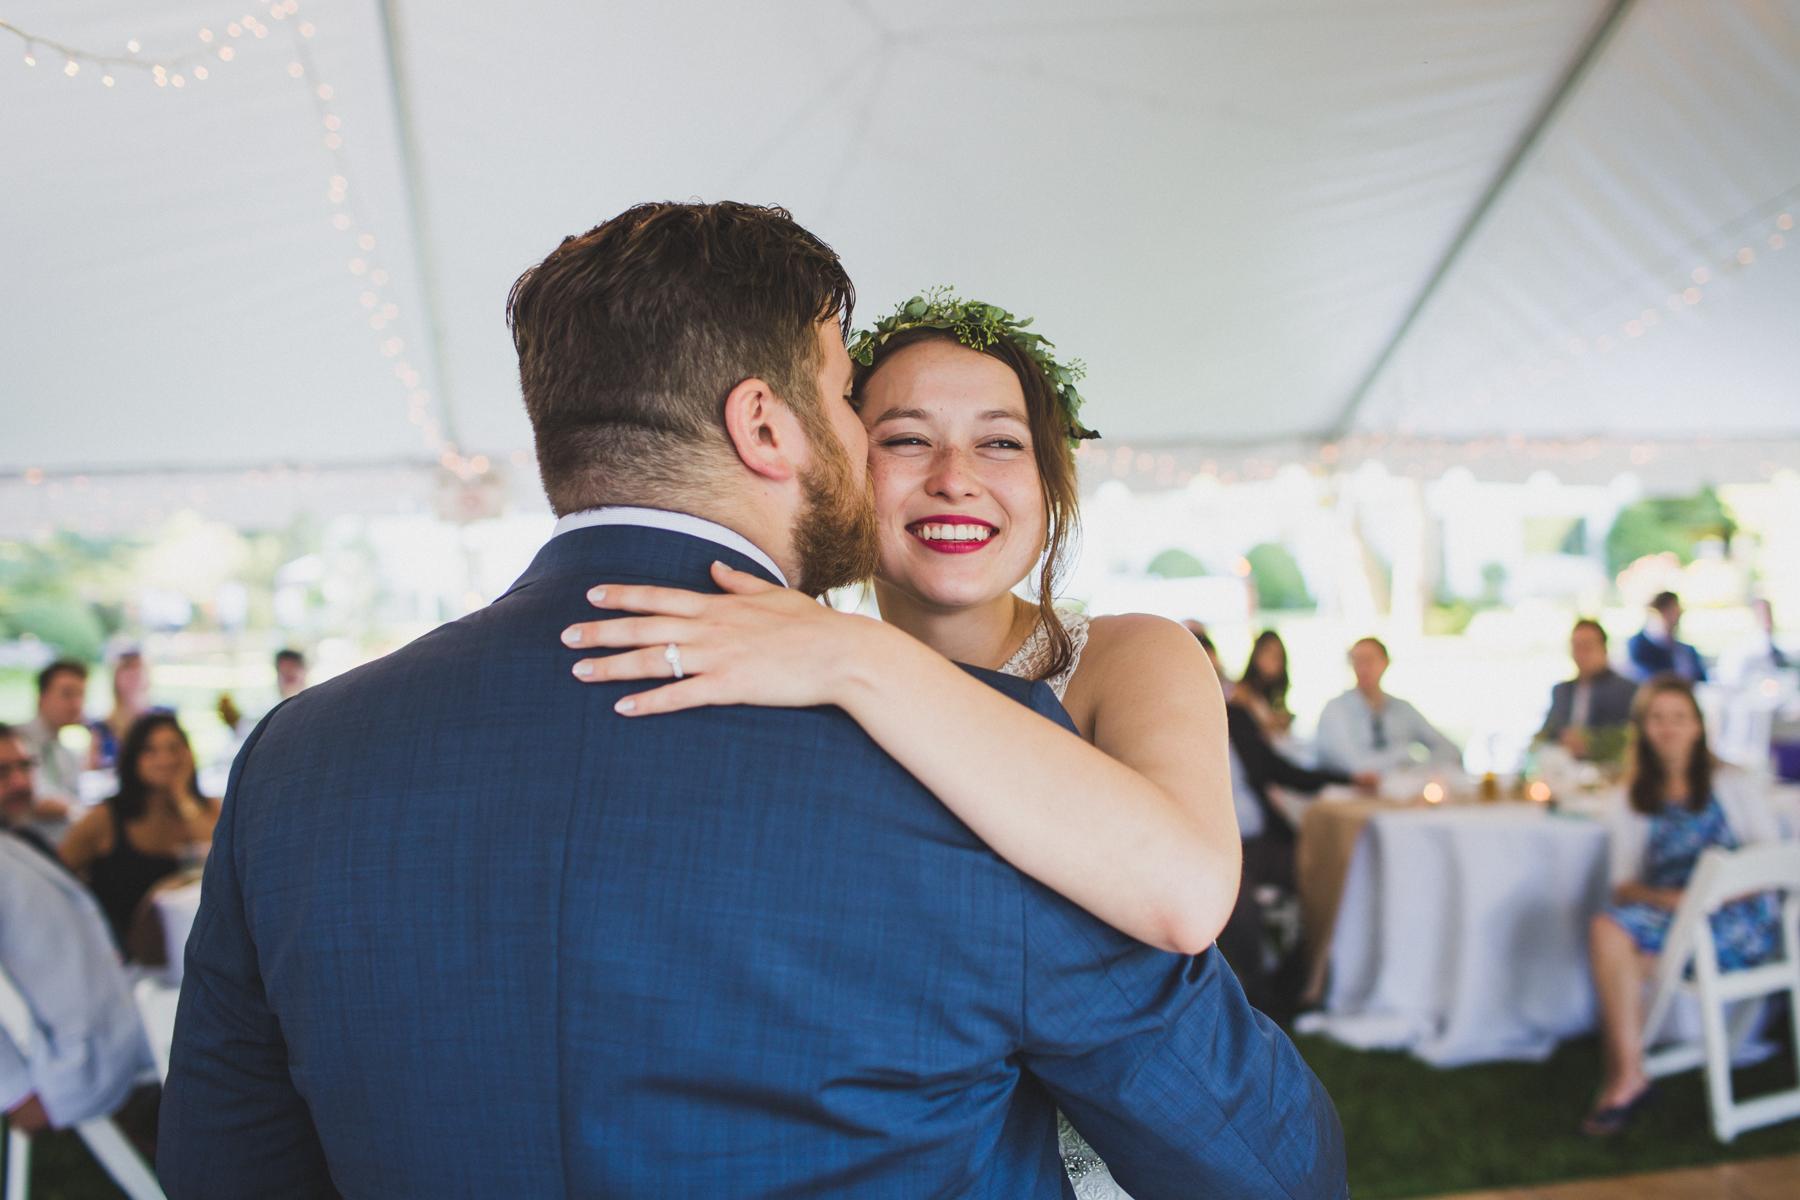 Long-Island-Documentary-Wedding-Photography-Summer-Tent-Wedding-in-New-York-104.jpg